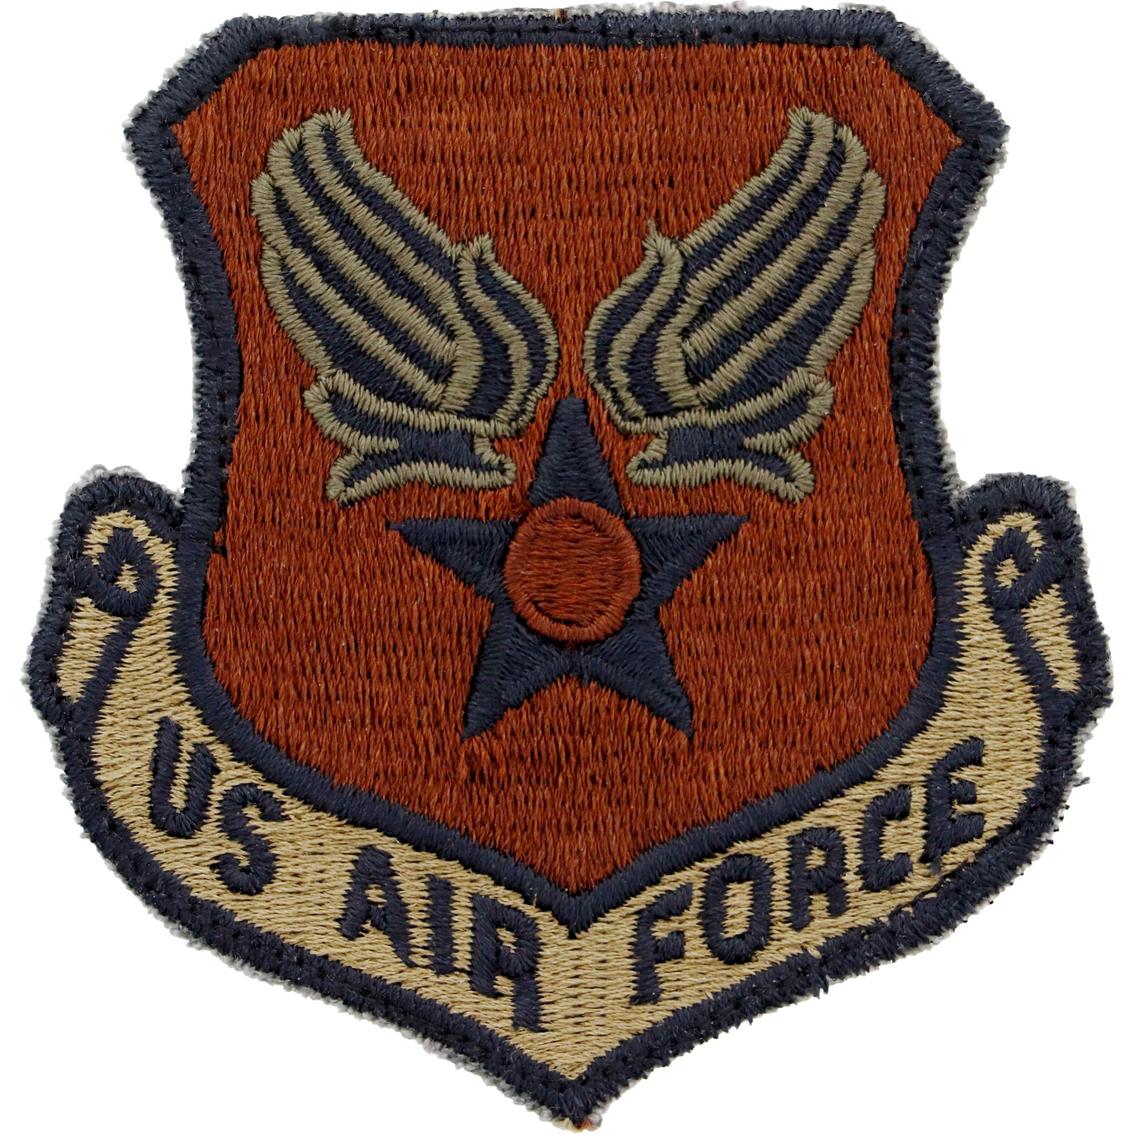 Air Force Patch Usaf Velcro (ocp)   Uniform Insignia